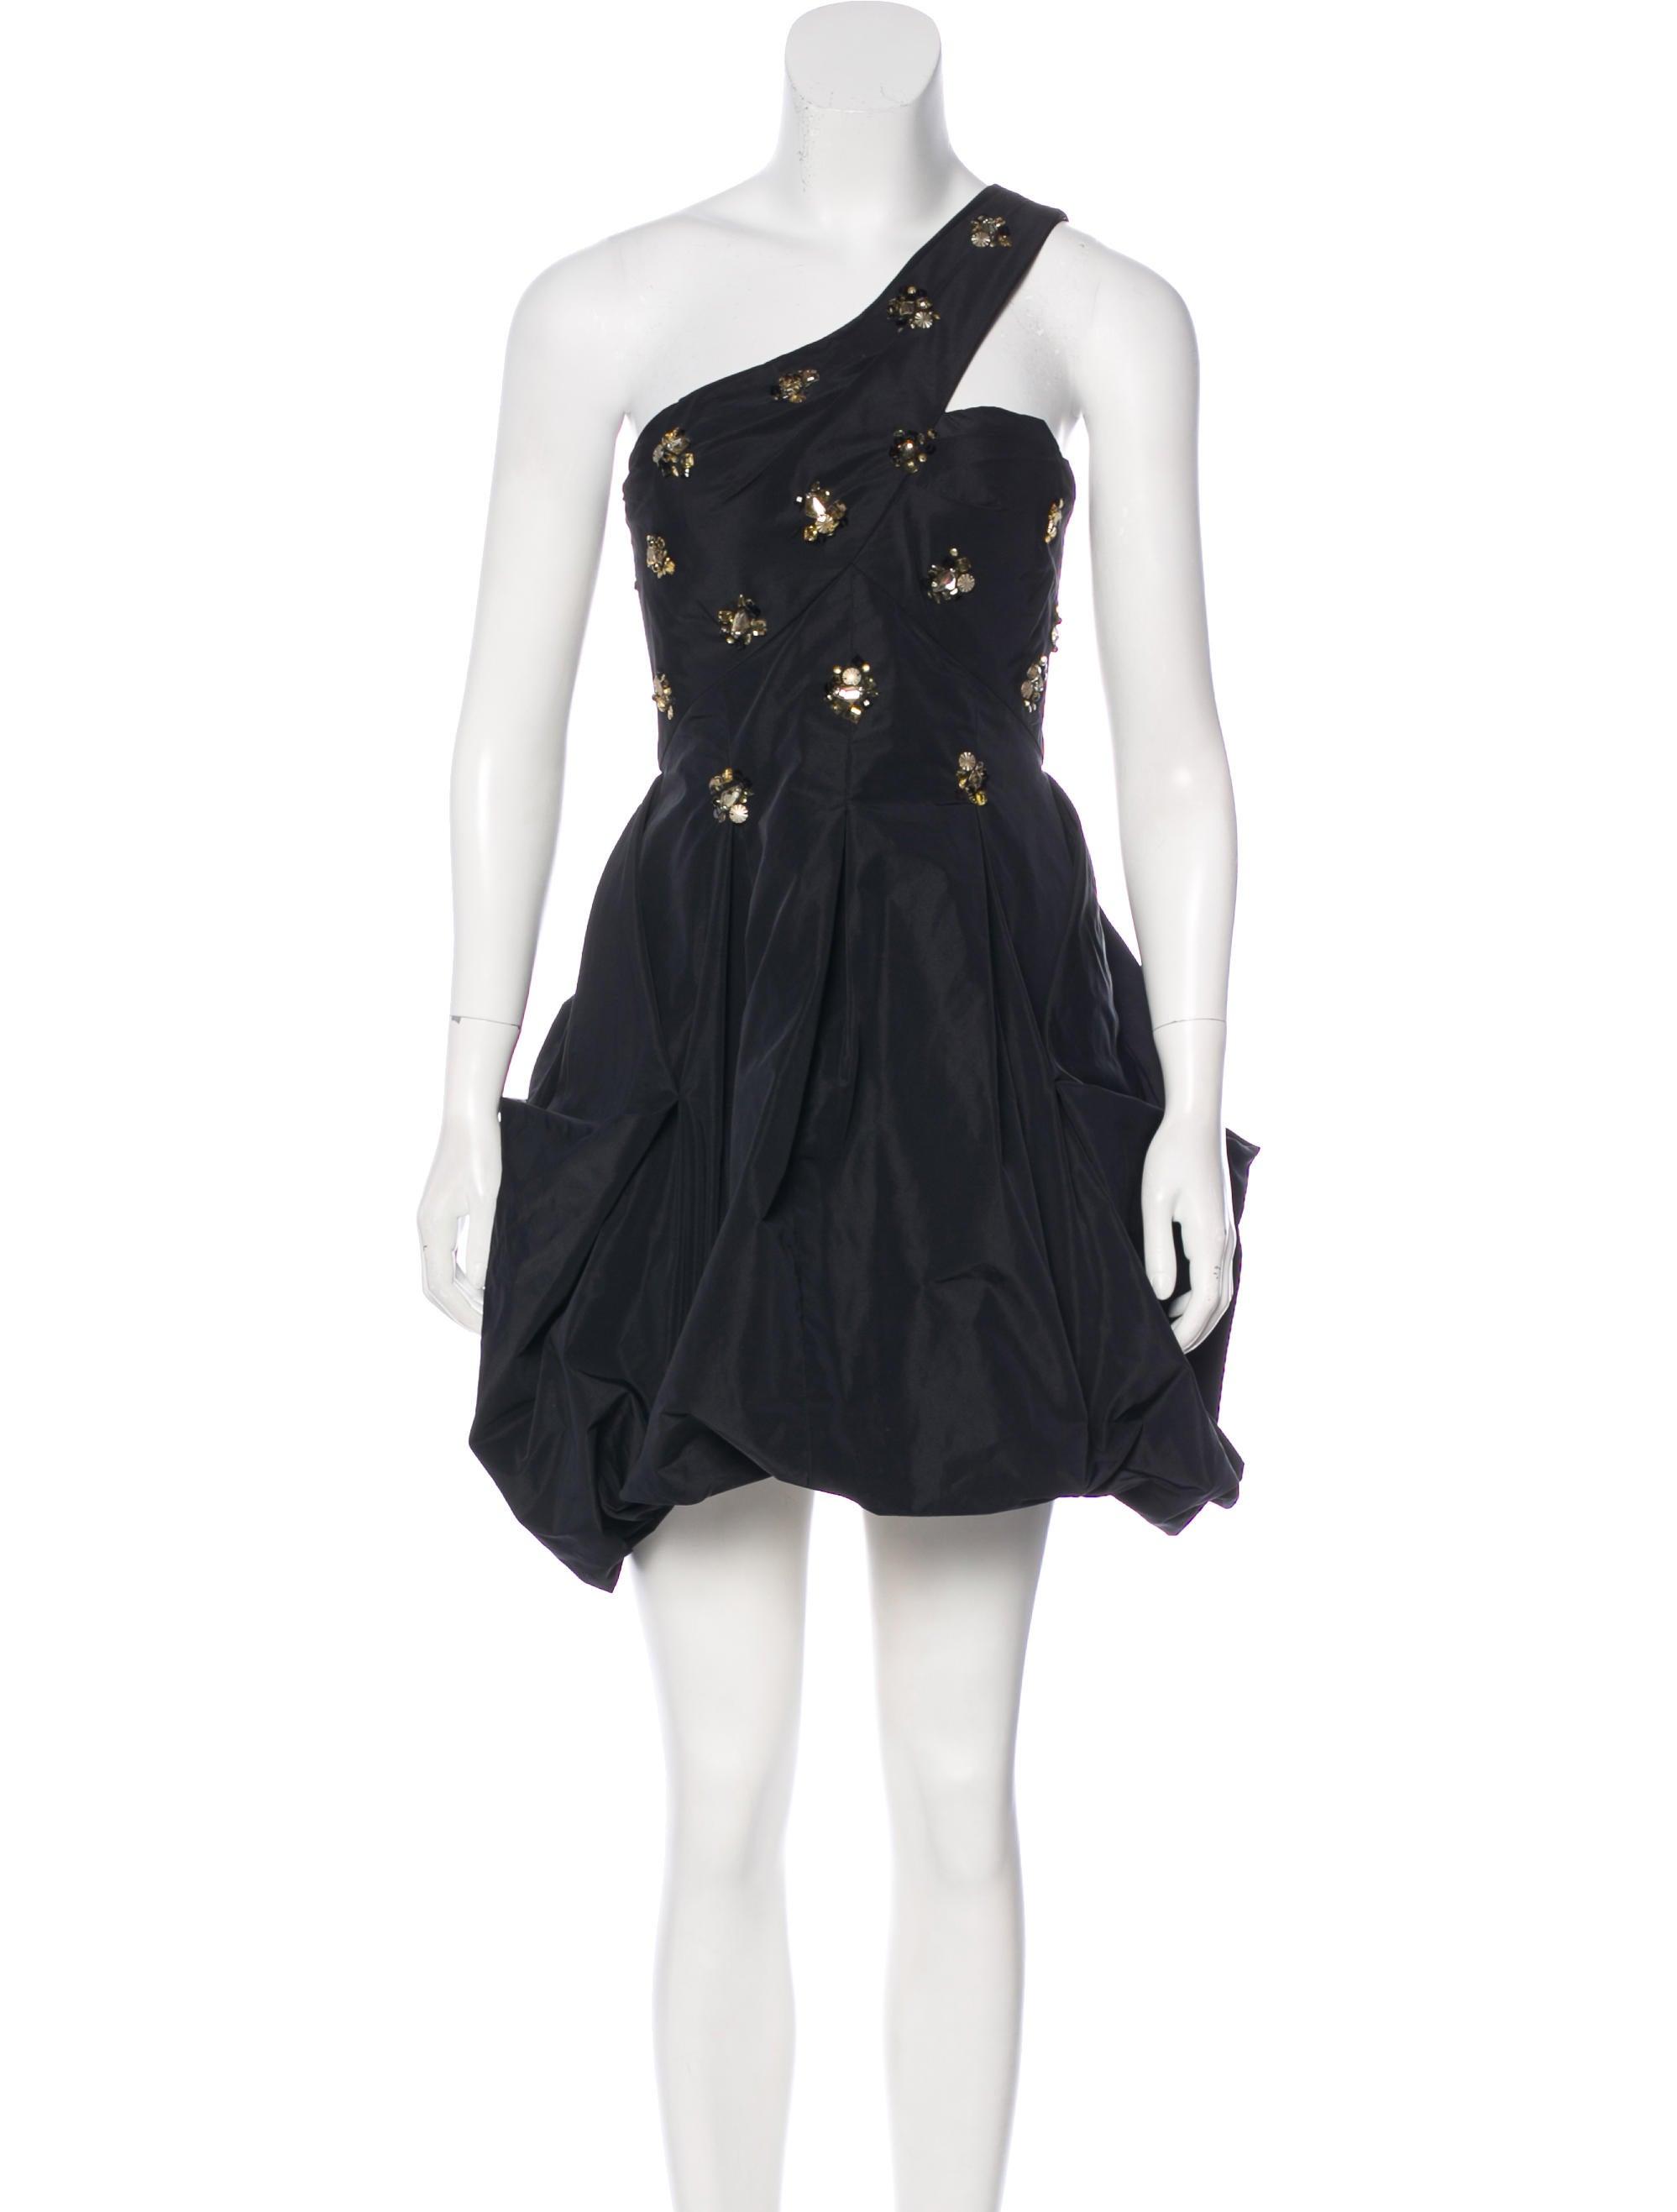 BCBG Max Azria Embellished Cocktail Dress - Clothing - WBC21492 ...